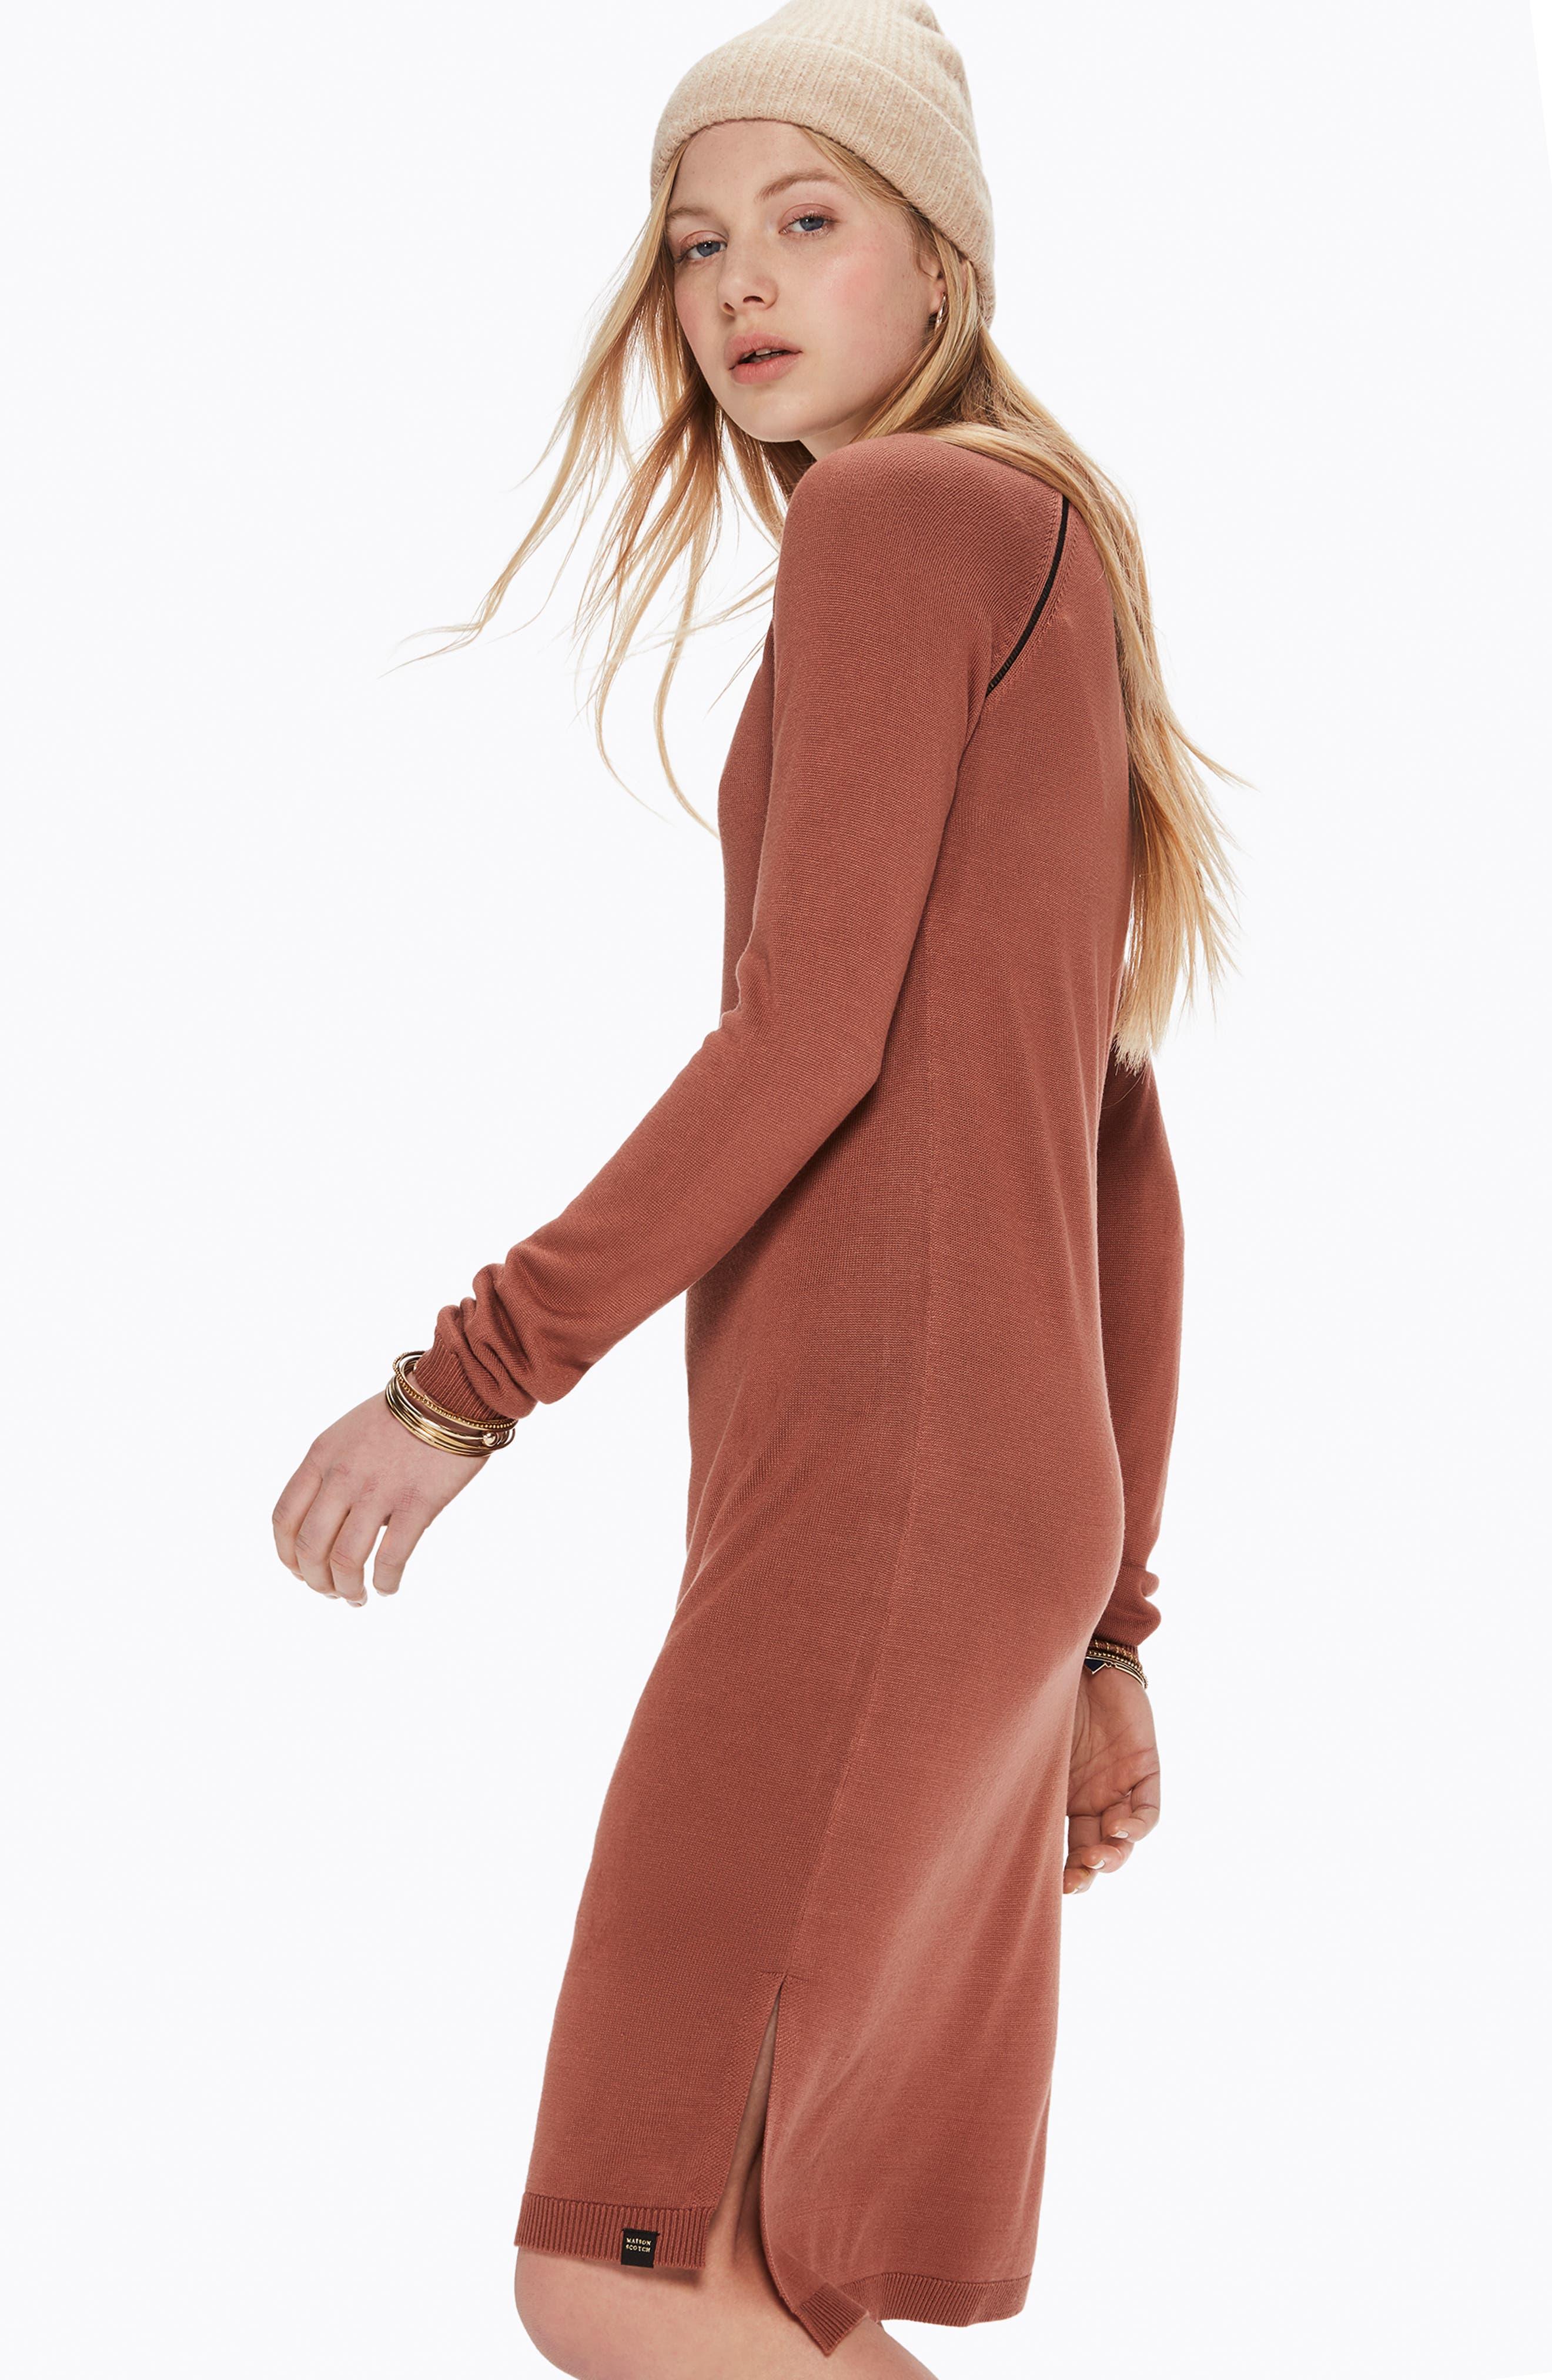 Ladder Inset Sweater Dress,                             Alternate thumbnail 10, color,                             VINTAGE ROSE